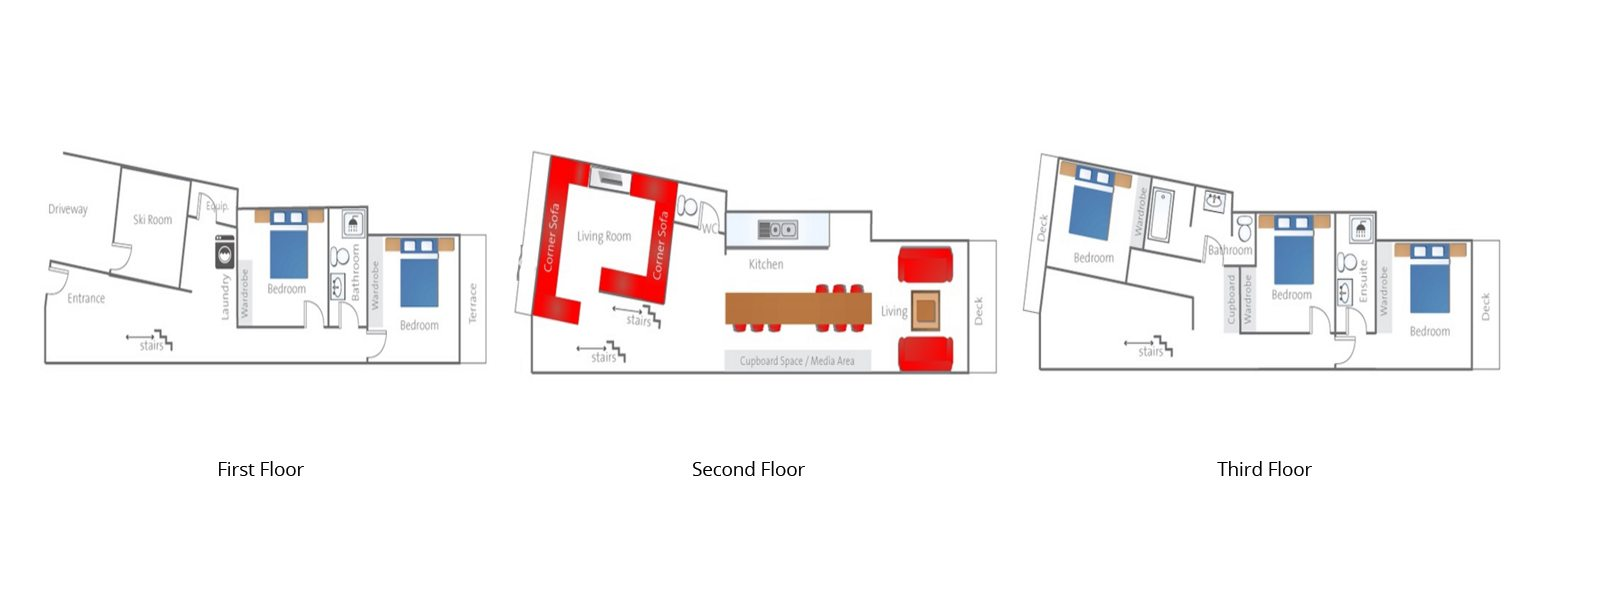 Tamo Floorplan | Hirafu, Niseko